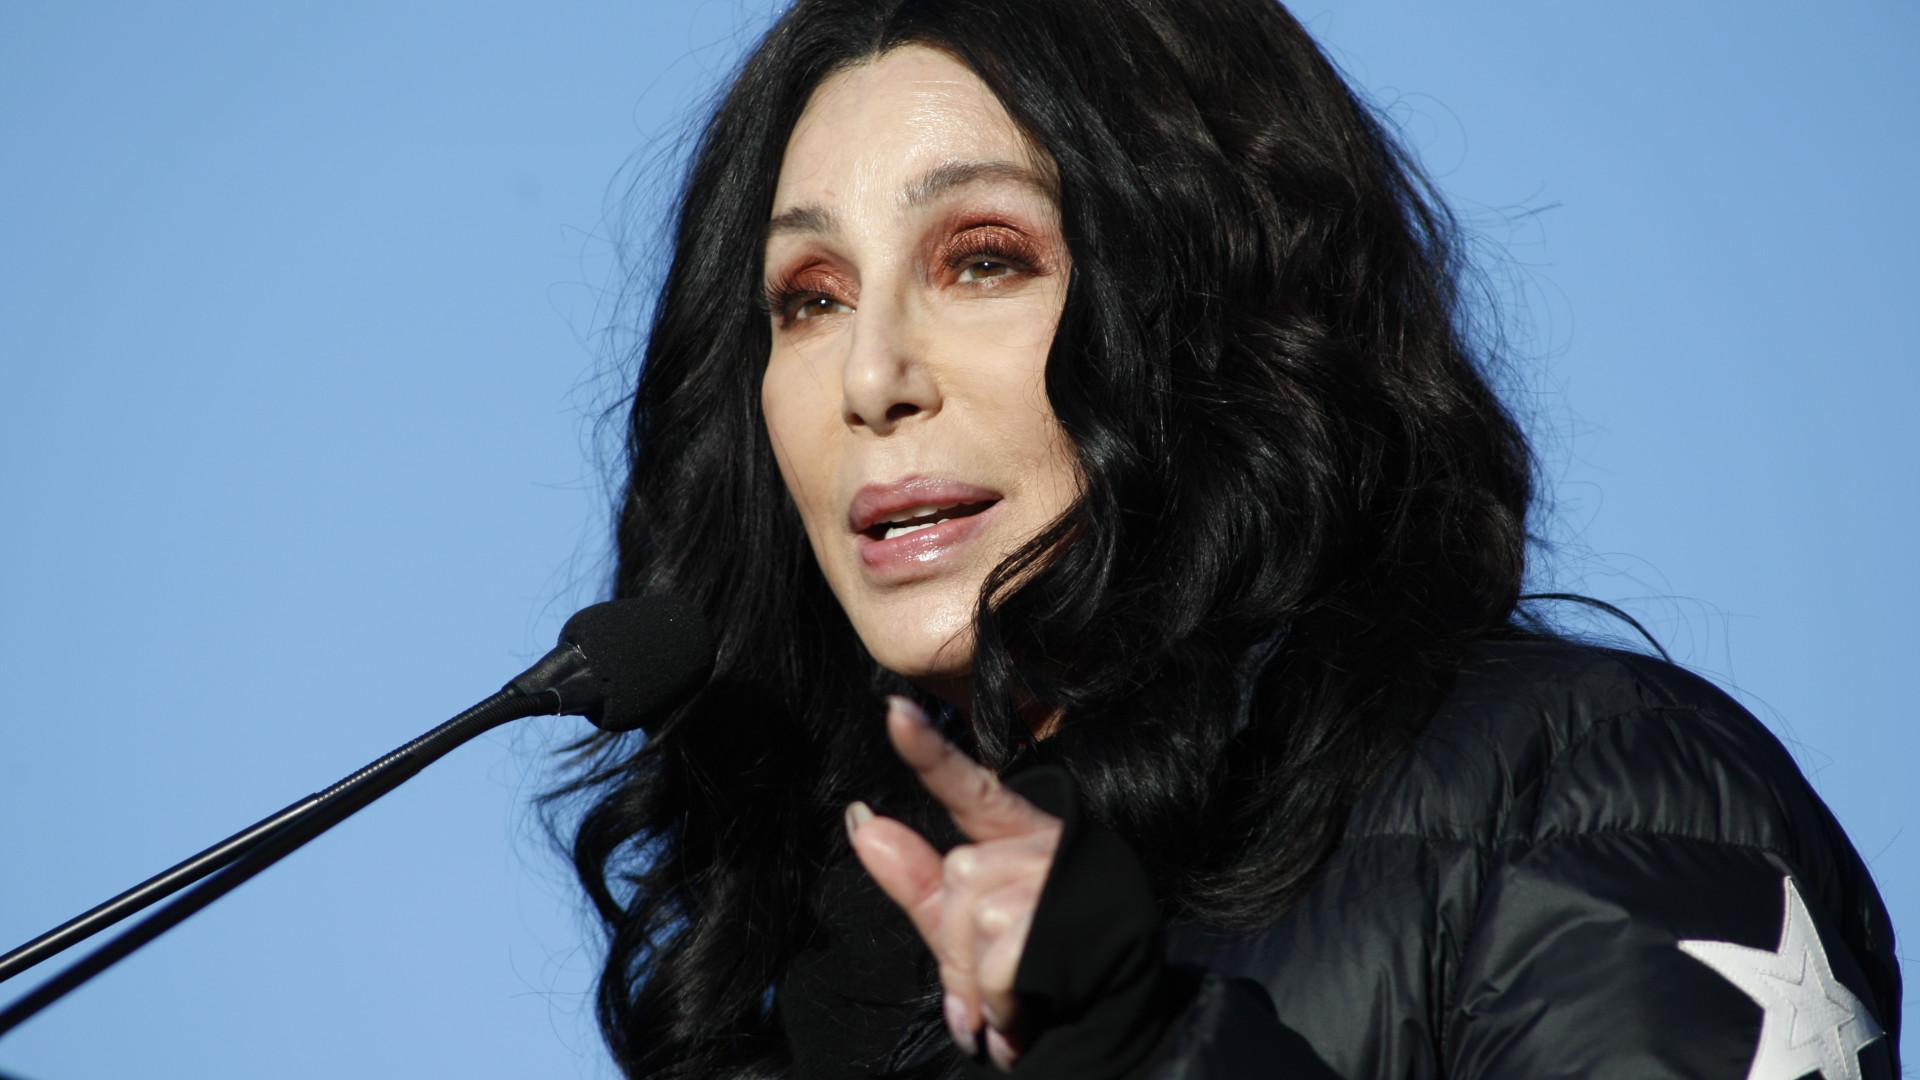 Cher recorda momento 'especial' passado ao lado de Stephen Hawking